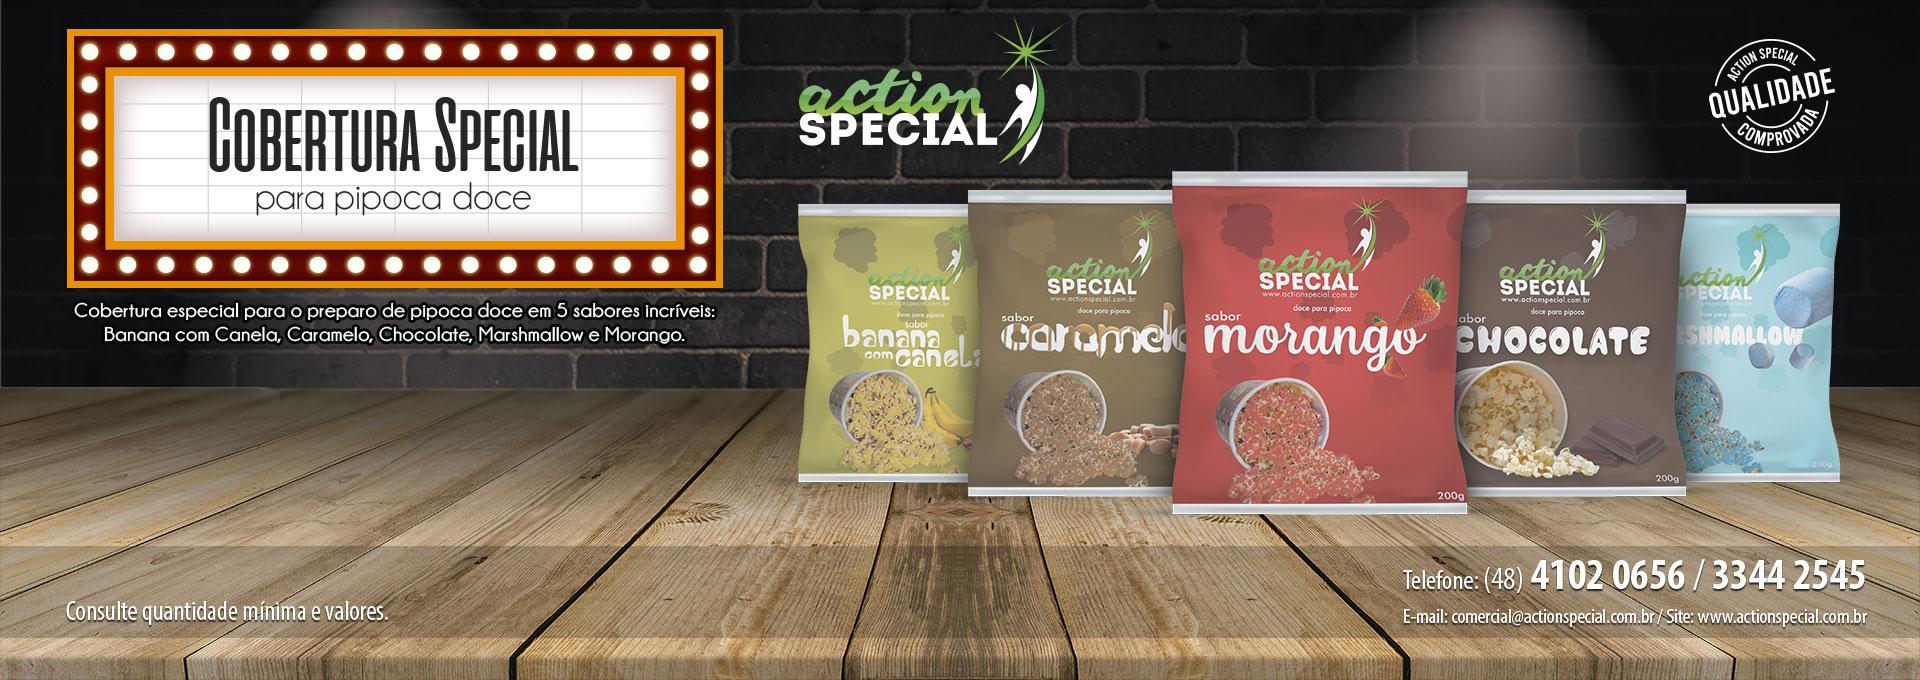 Banner_Cobertura_Special_Site